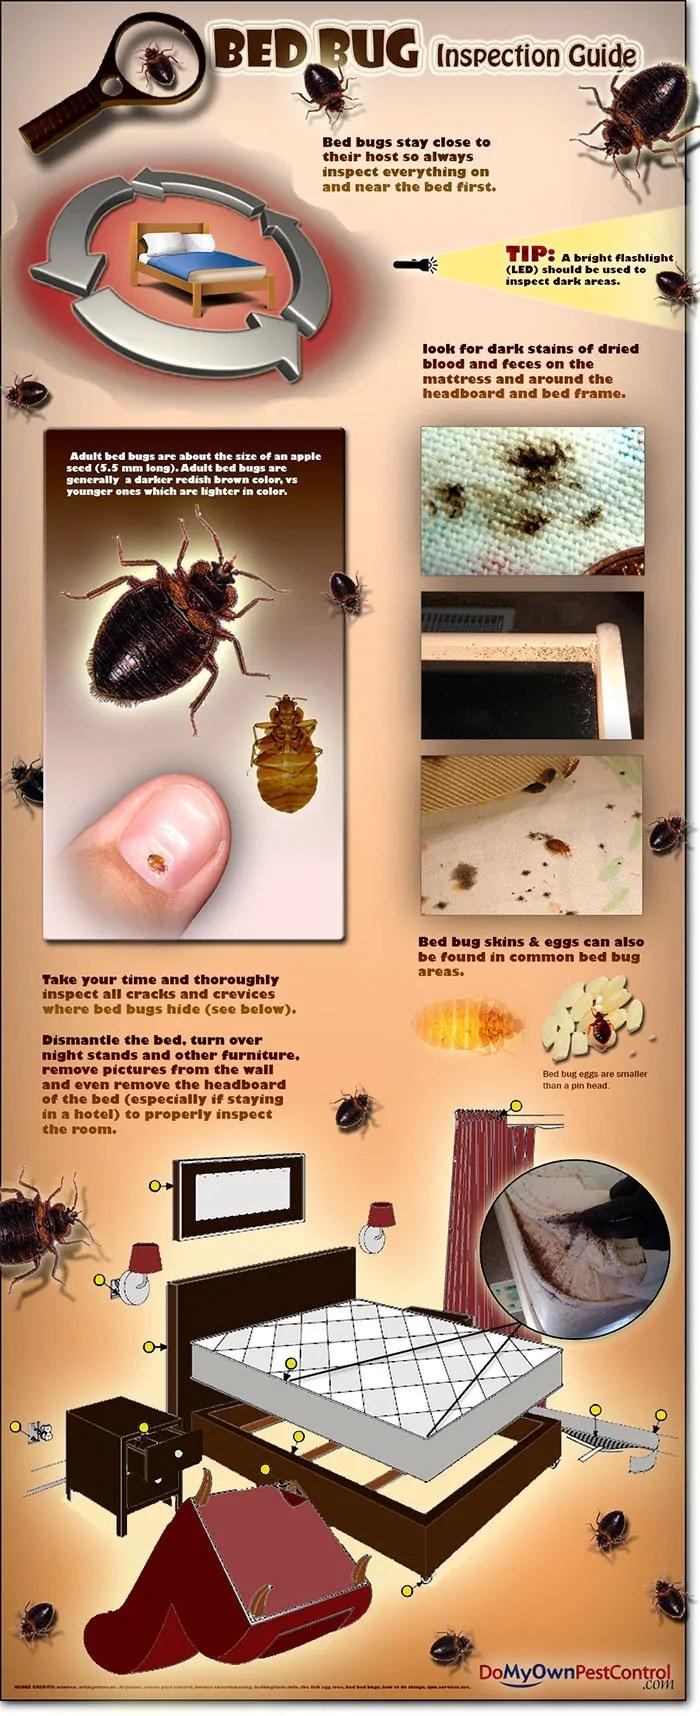 Bed bug inspectation guide